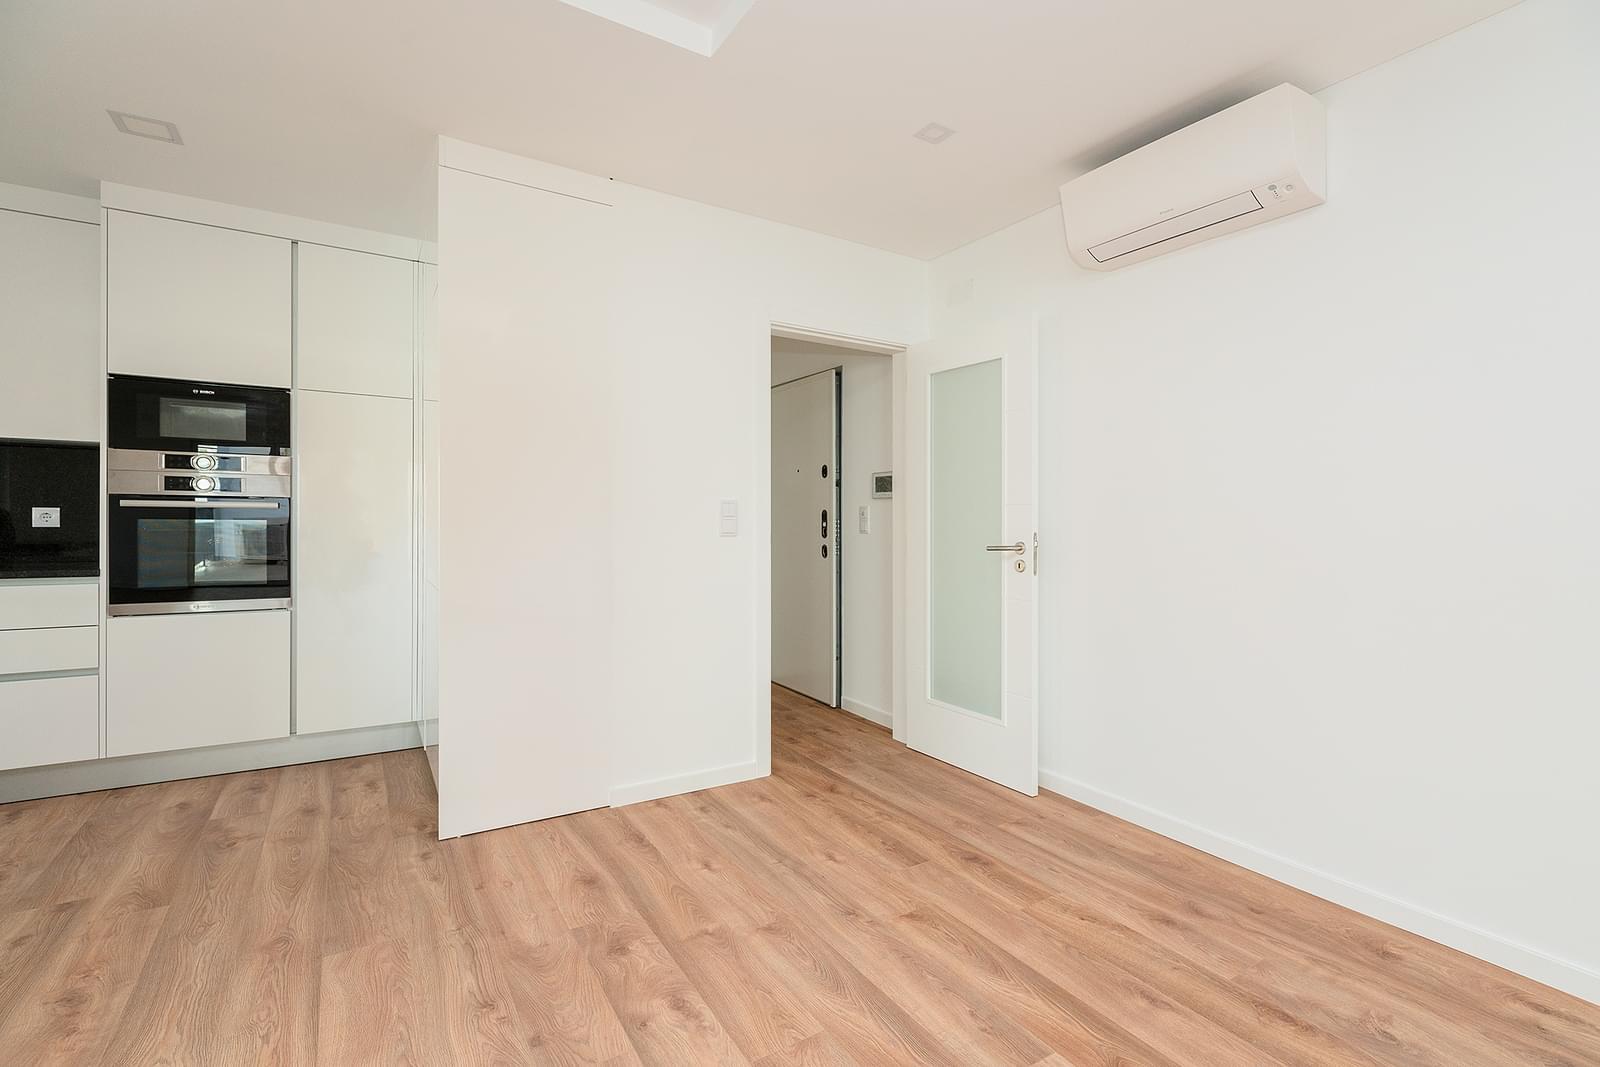 pf16829-apartamento-t1-lisboa-821a913e-0d17-4918-a4c2-2a2a5a09e54c